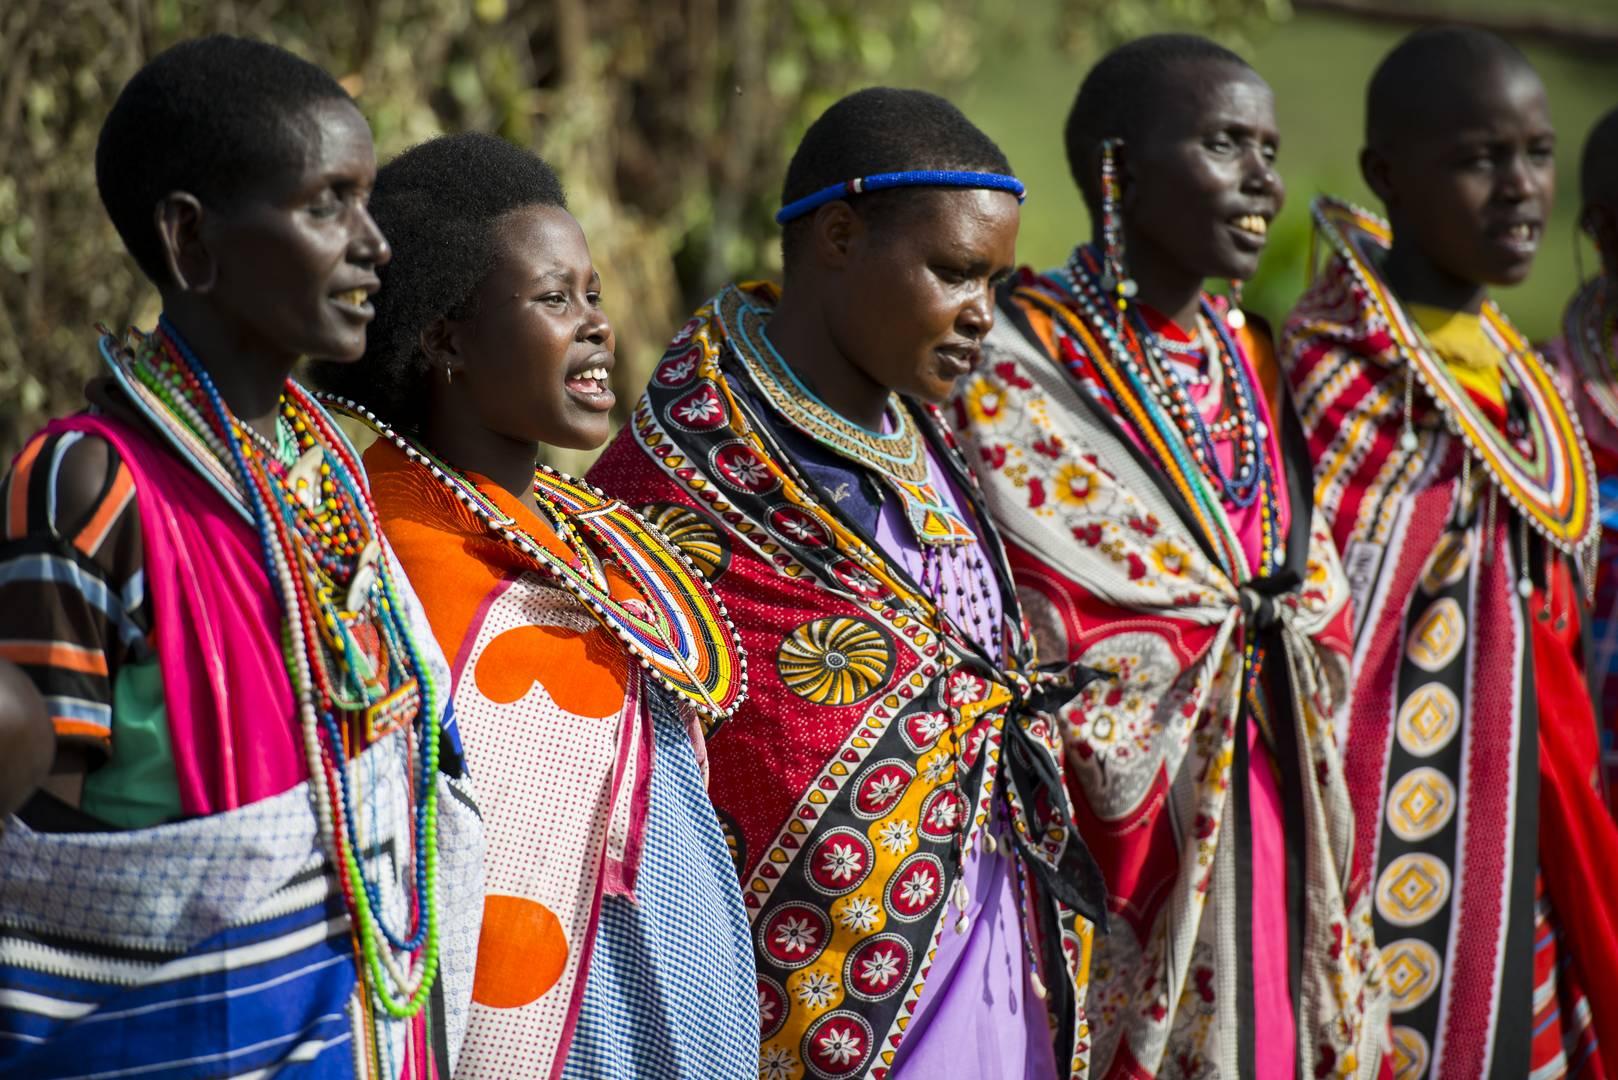 Guía de viaje a Tanzania